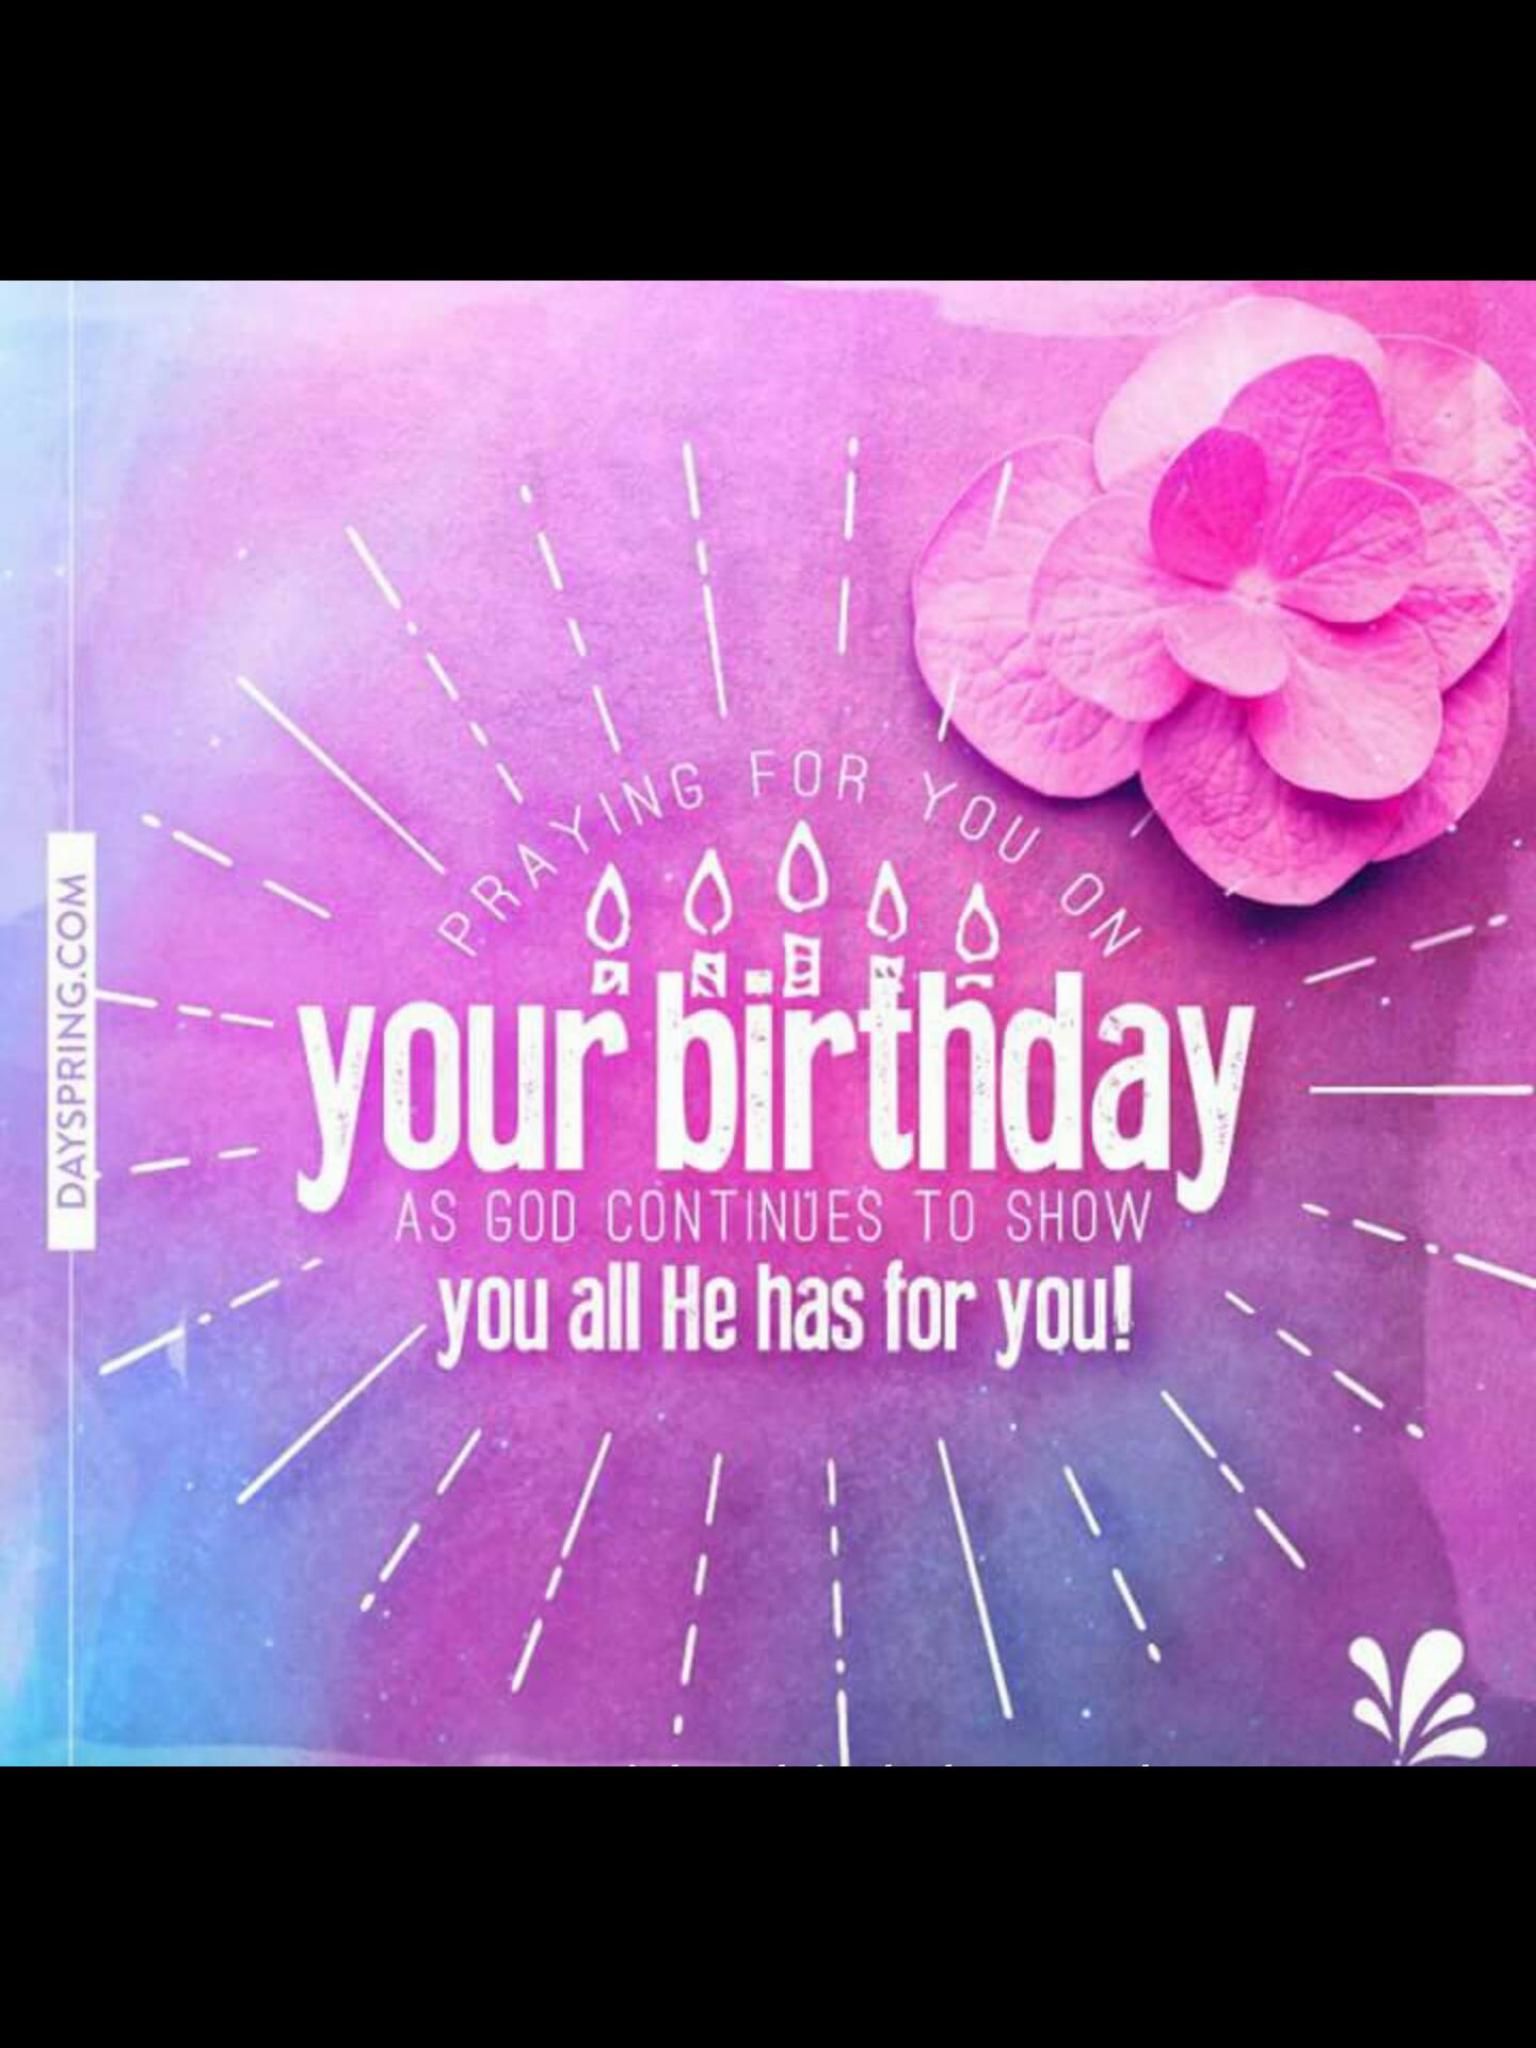 Happy Birthday Christian Quotes Pinjana Wright On Ecards  Pinterest  Happy Birthday